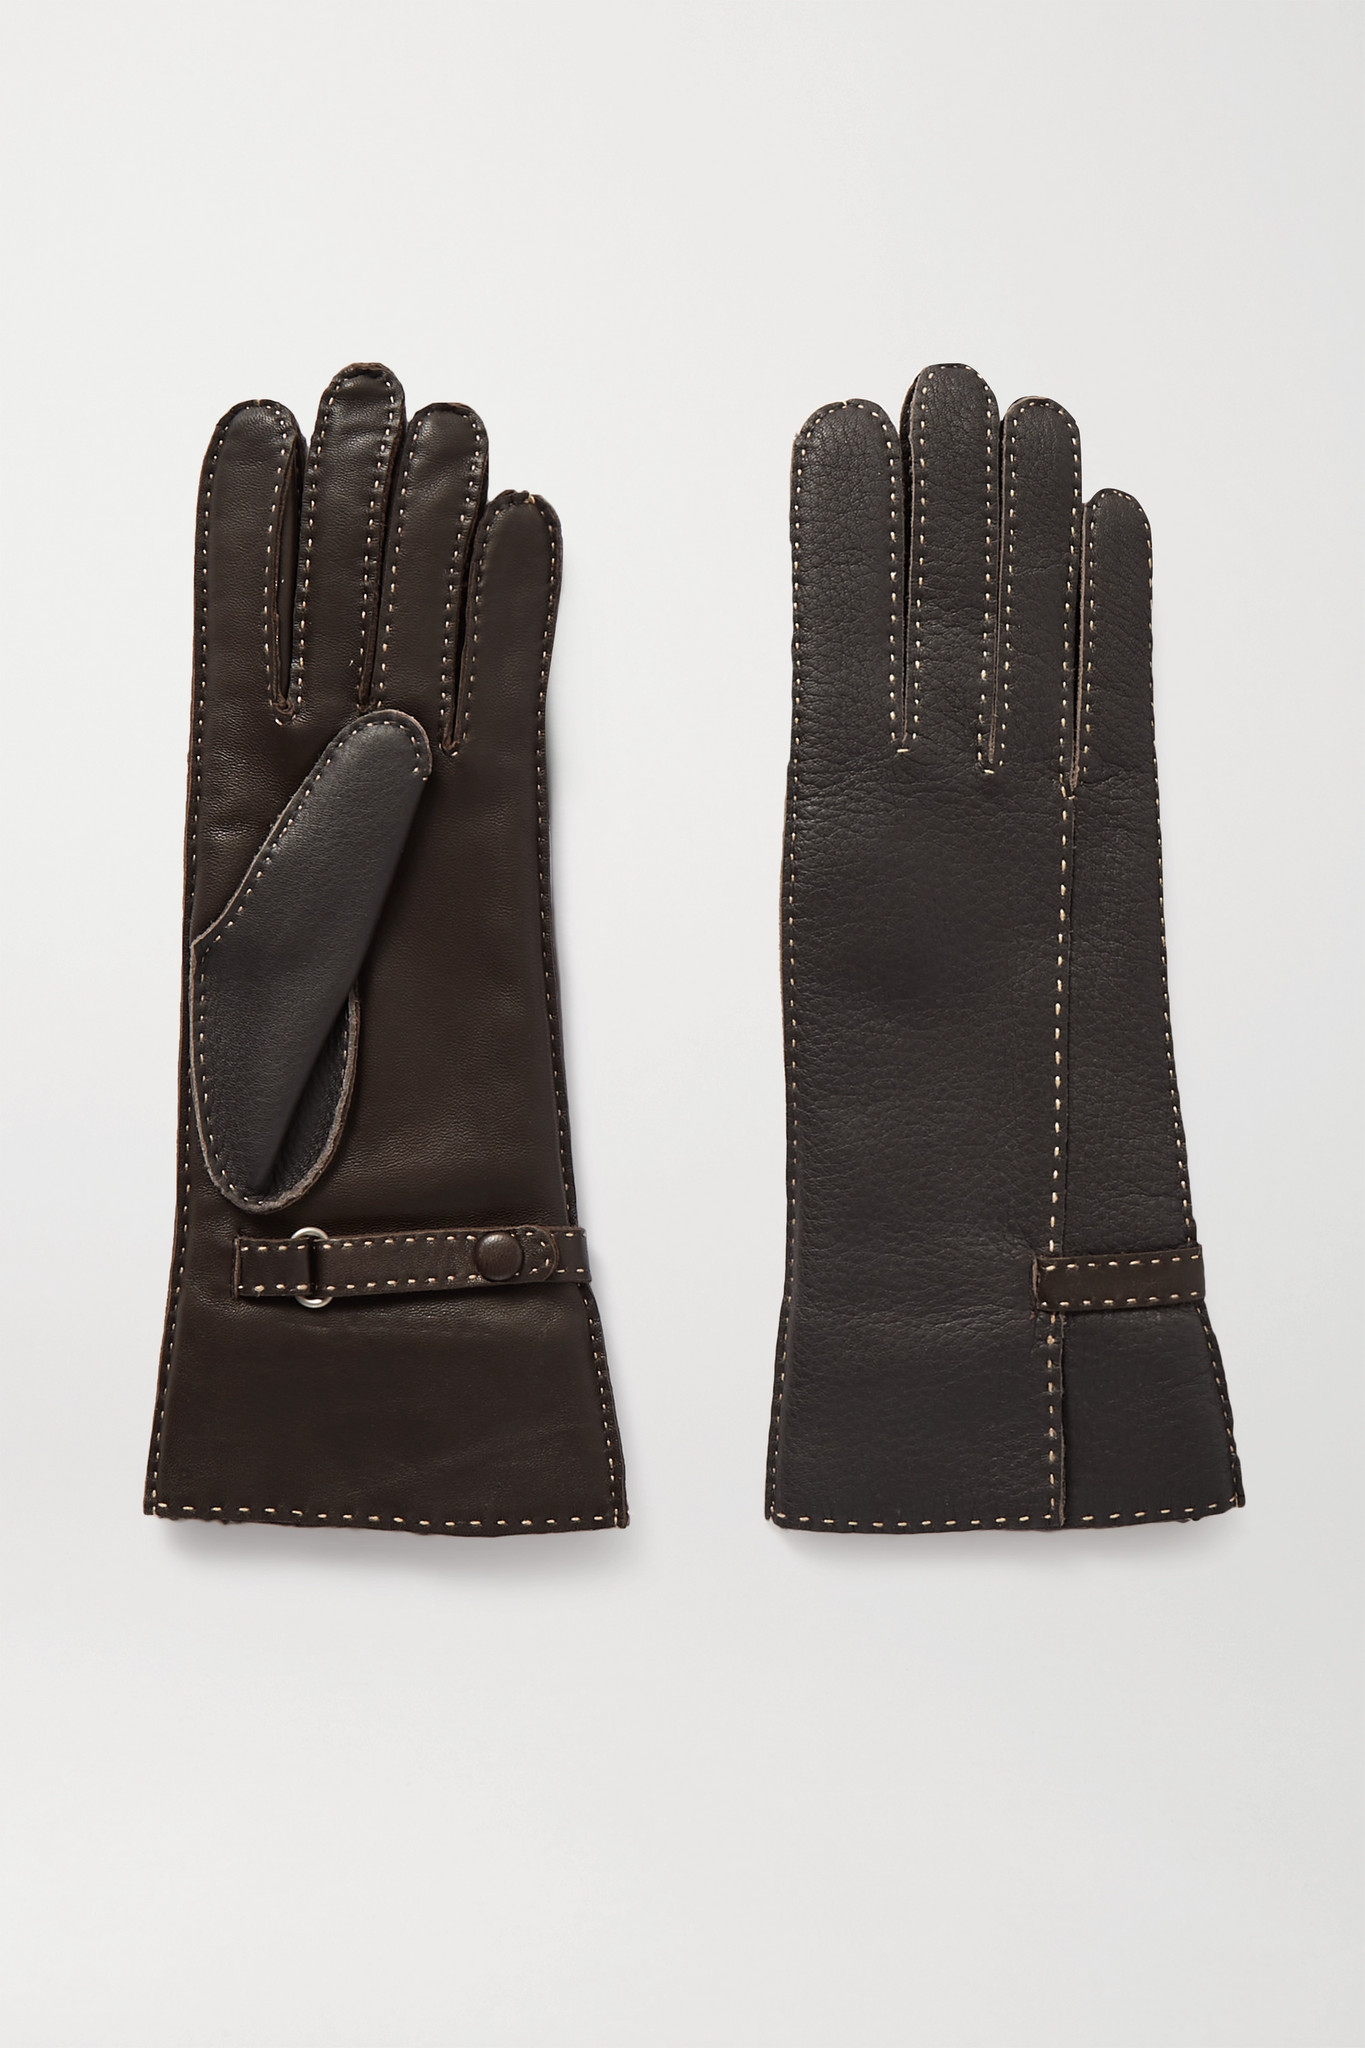 Agnelle - Sharil 明线细节皮革手套 - 棕色 - 6.5